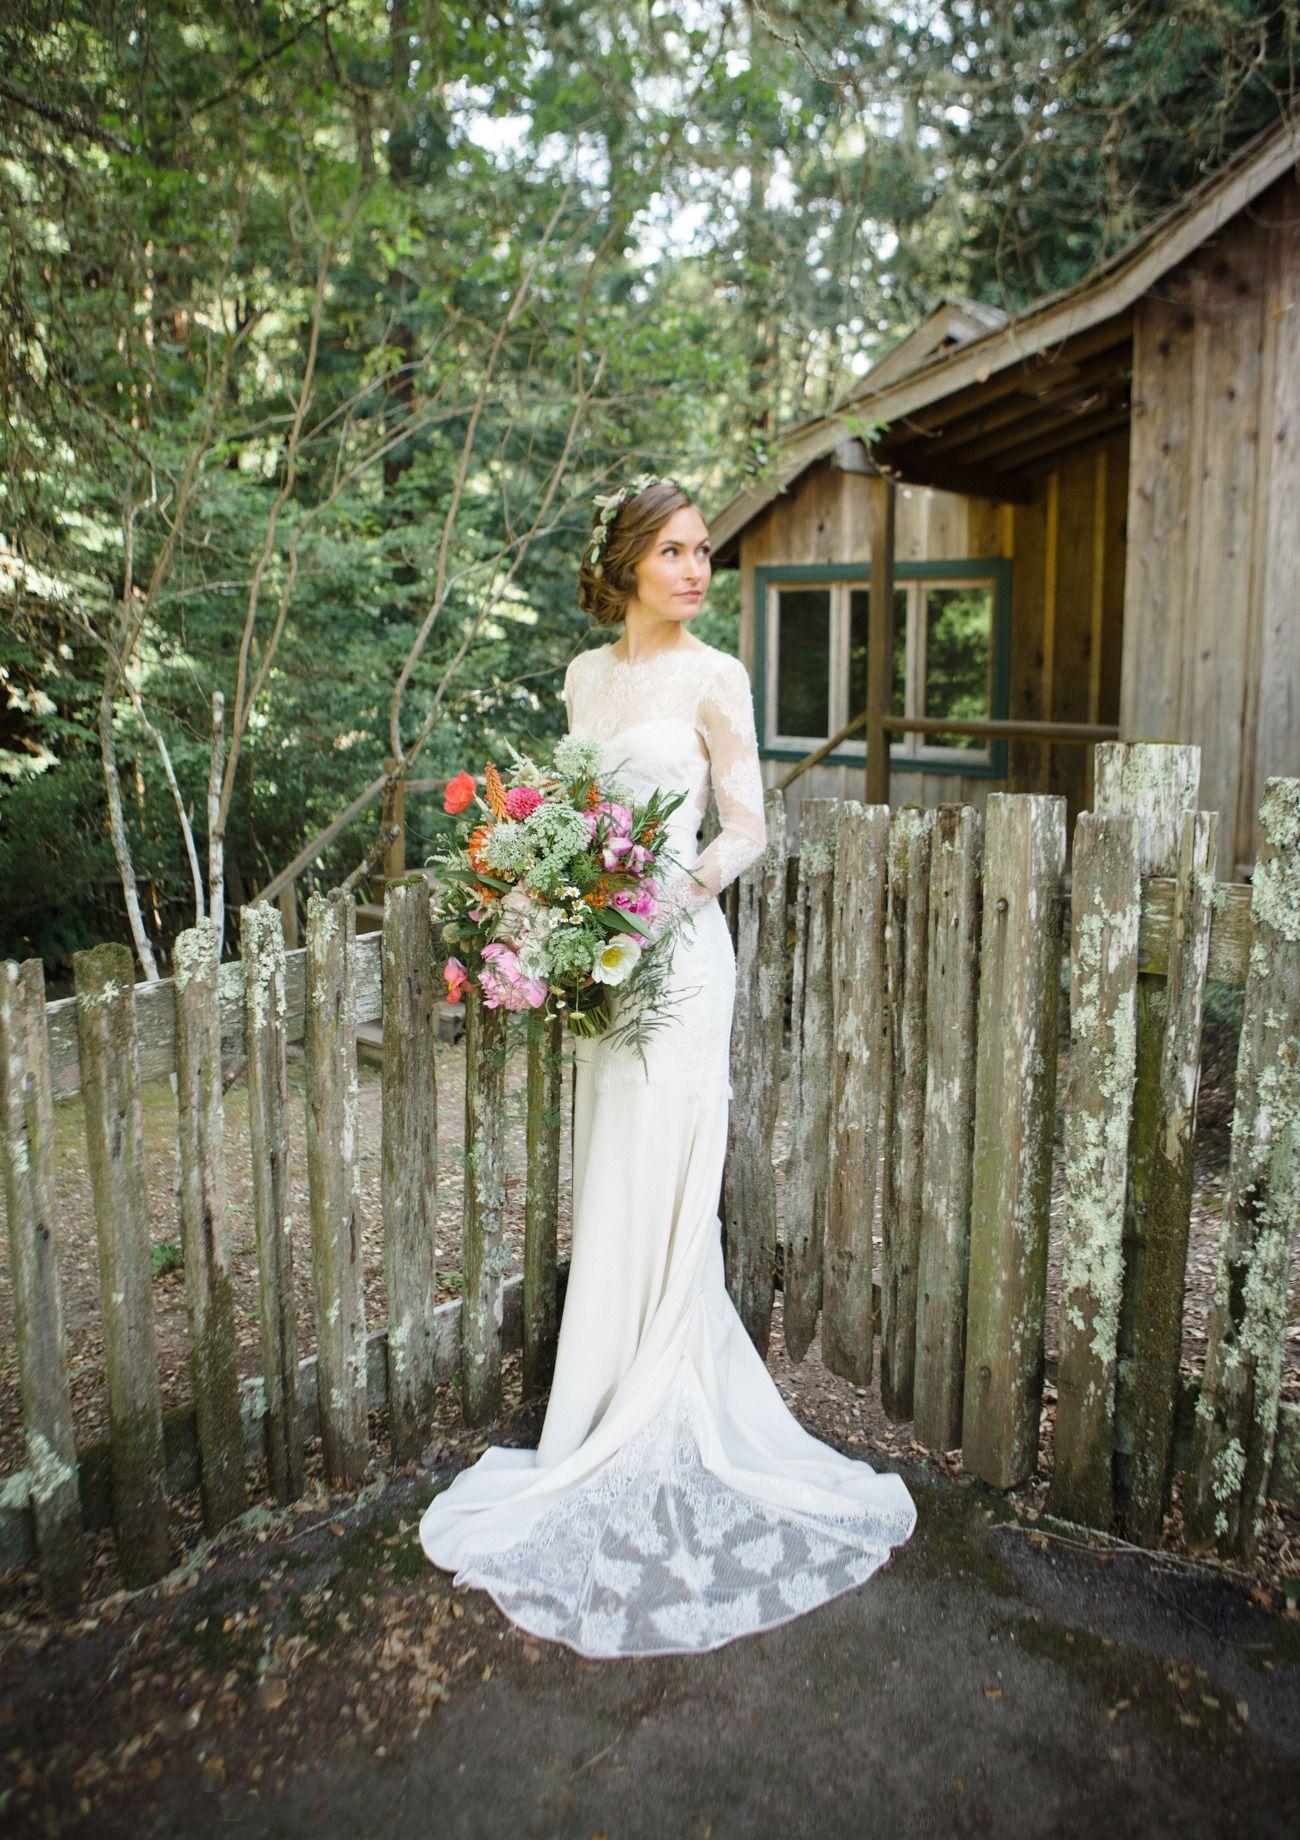 Romance In The Redwoods A Forest Wedding Wedding Dresses Vintage Inspired Wedding Dresses Mod Wedding [ 1840 x 1300 Pixel ]